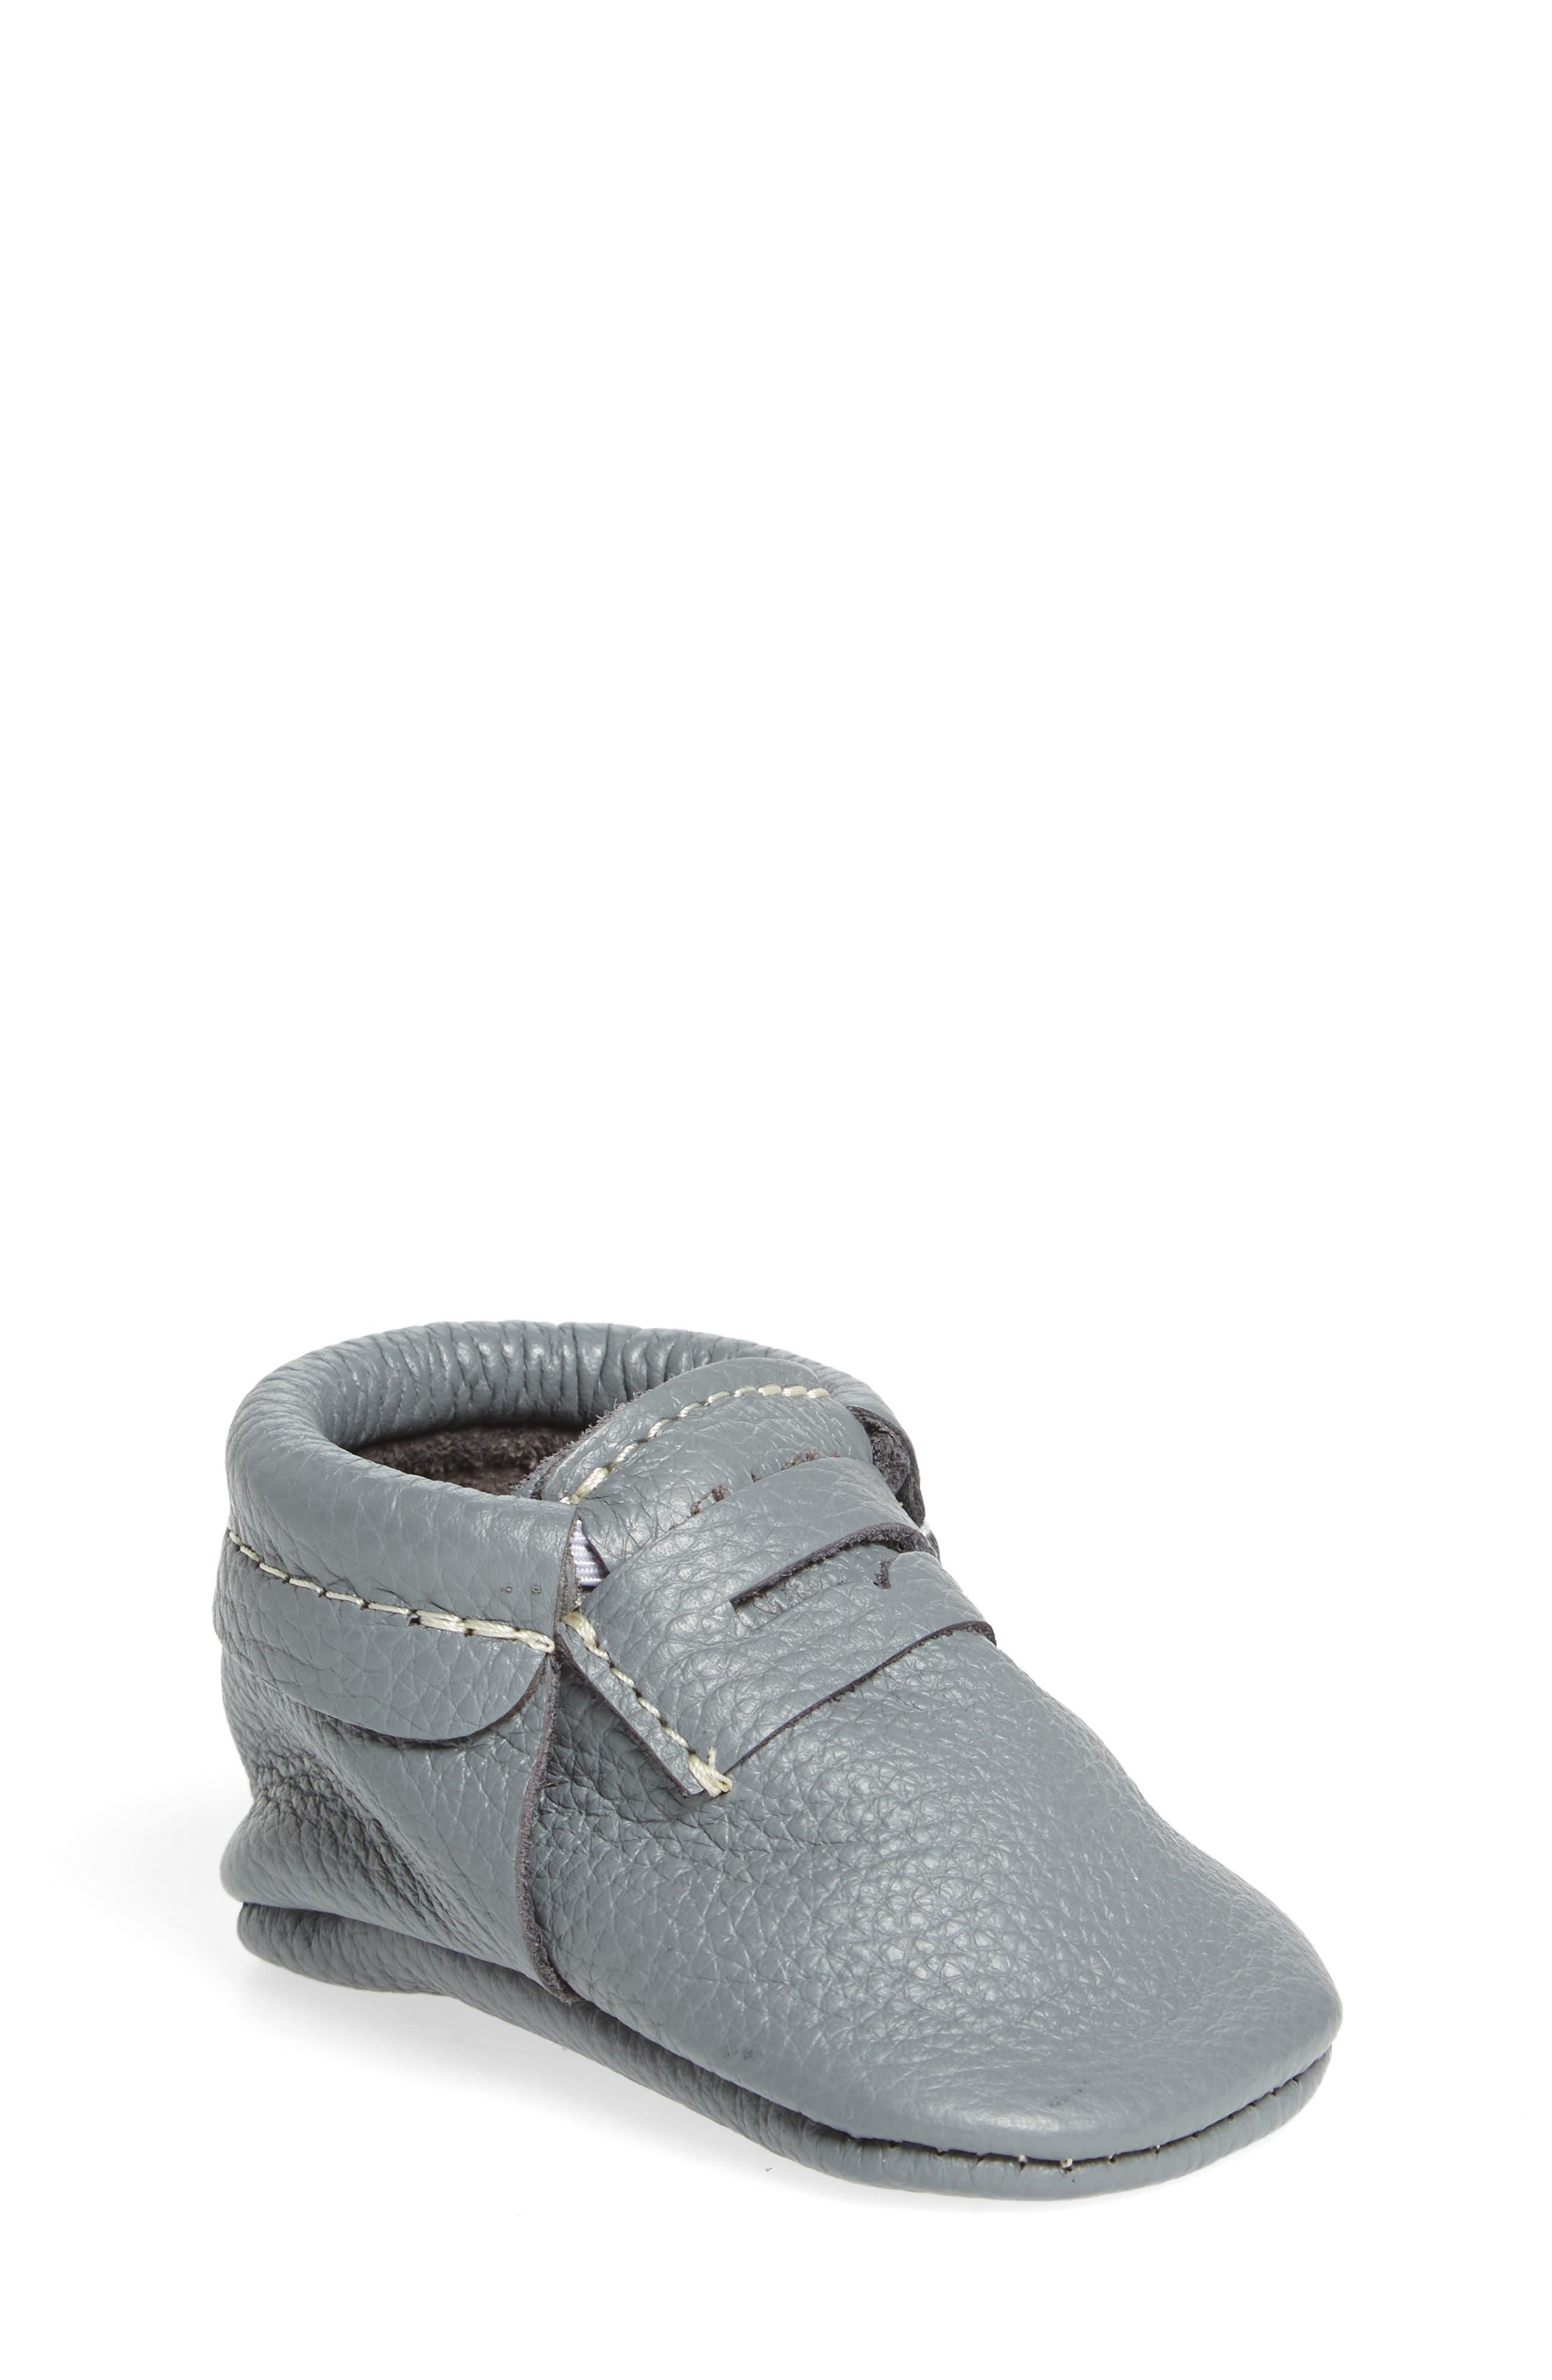 Freshly Picked Penny Loafer Crib Shoe (Baby & Walker)